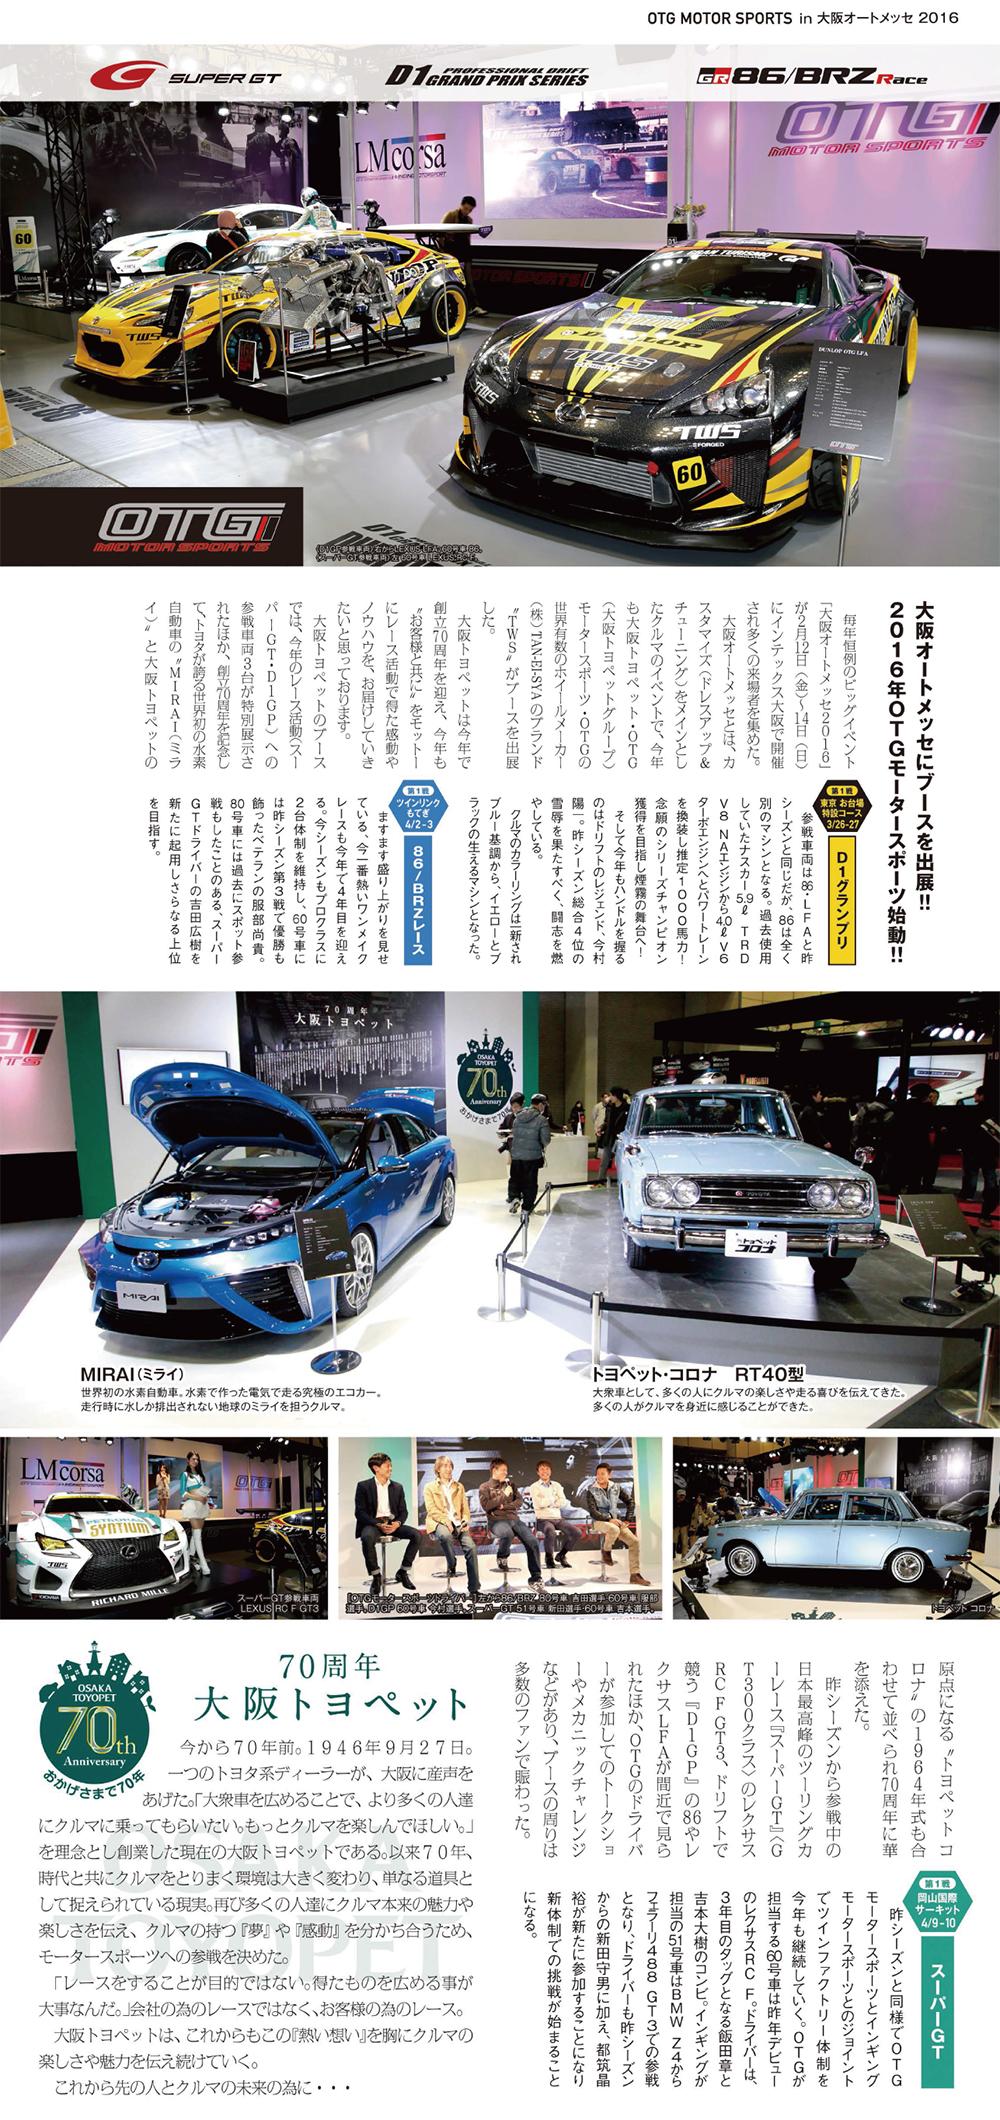 http://www.osaka-toyopet.jp/otg-ms/event_blog/img/auto-messe2016-1603.jpg